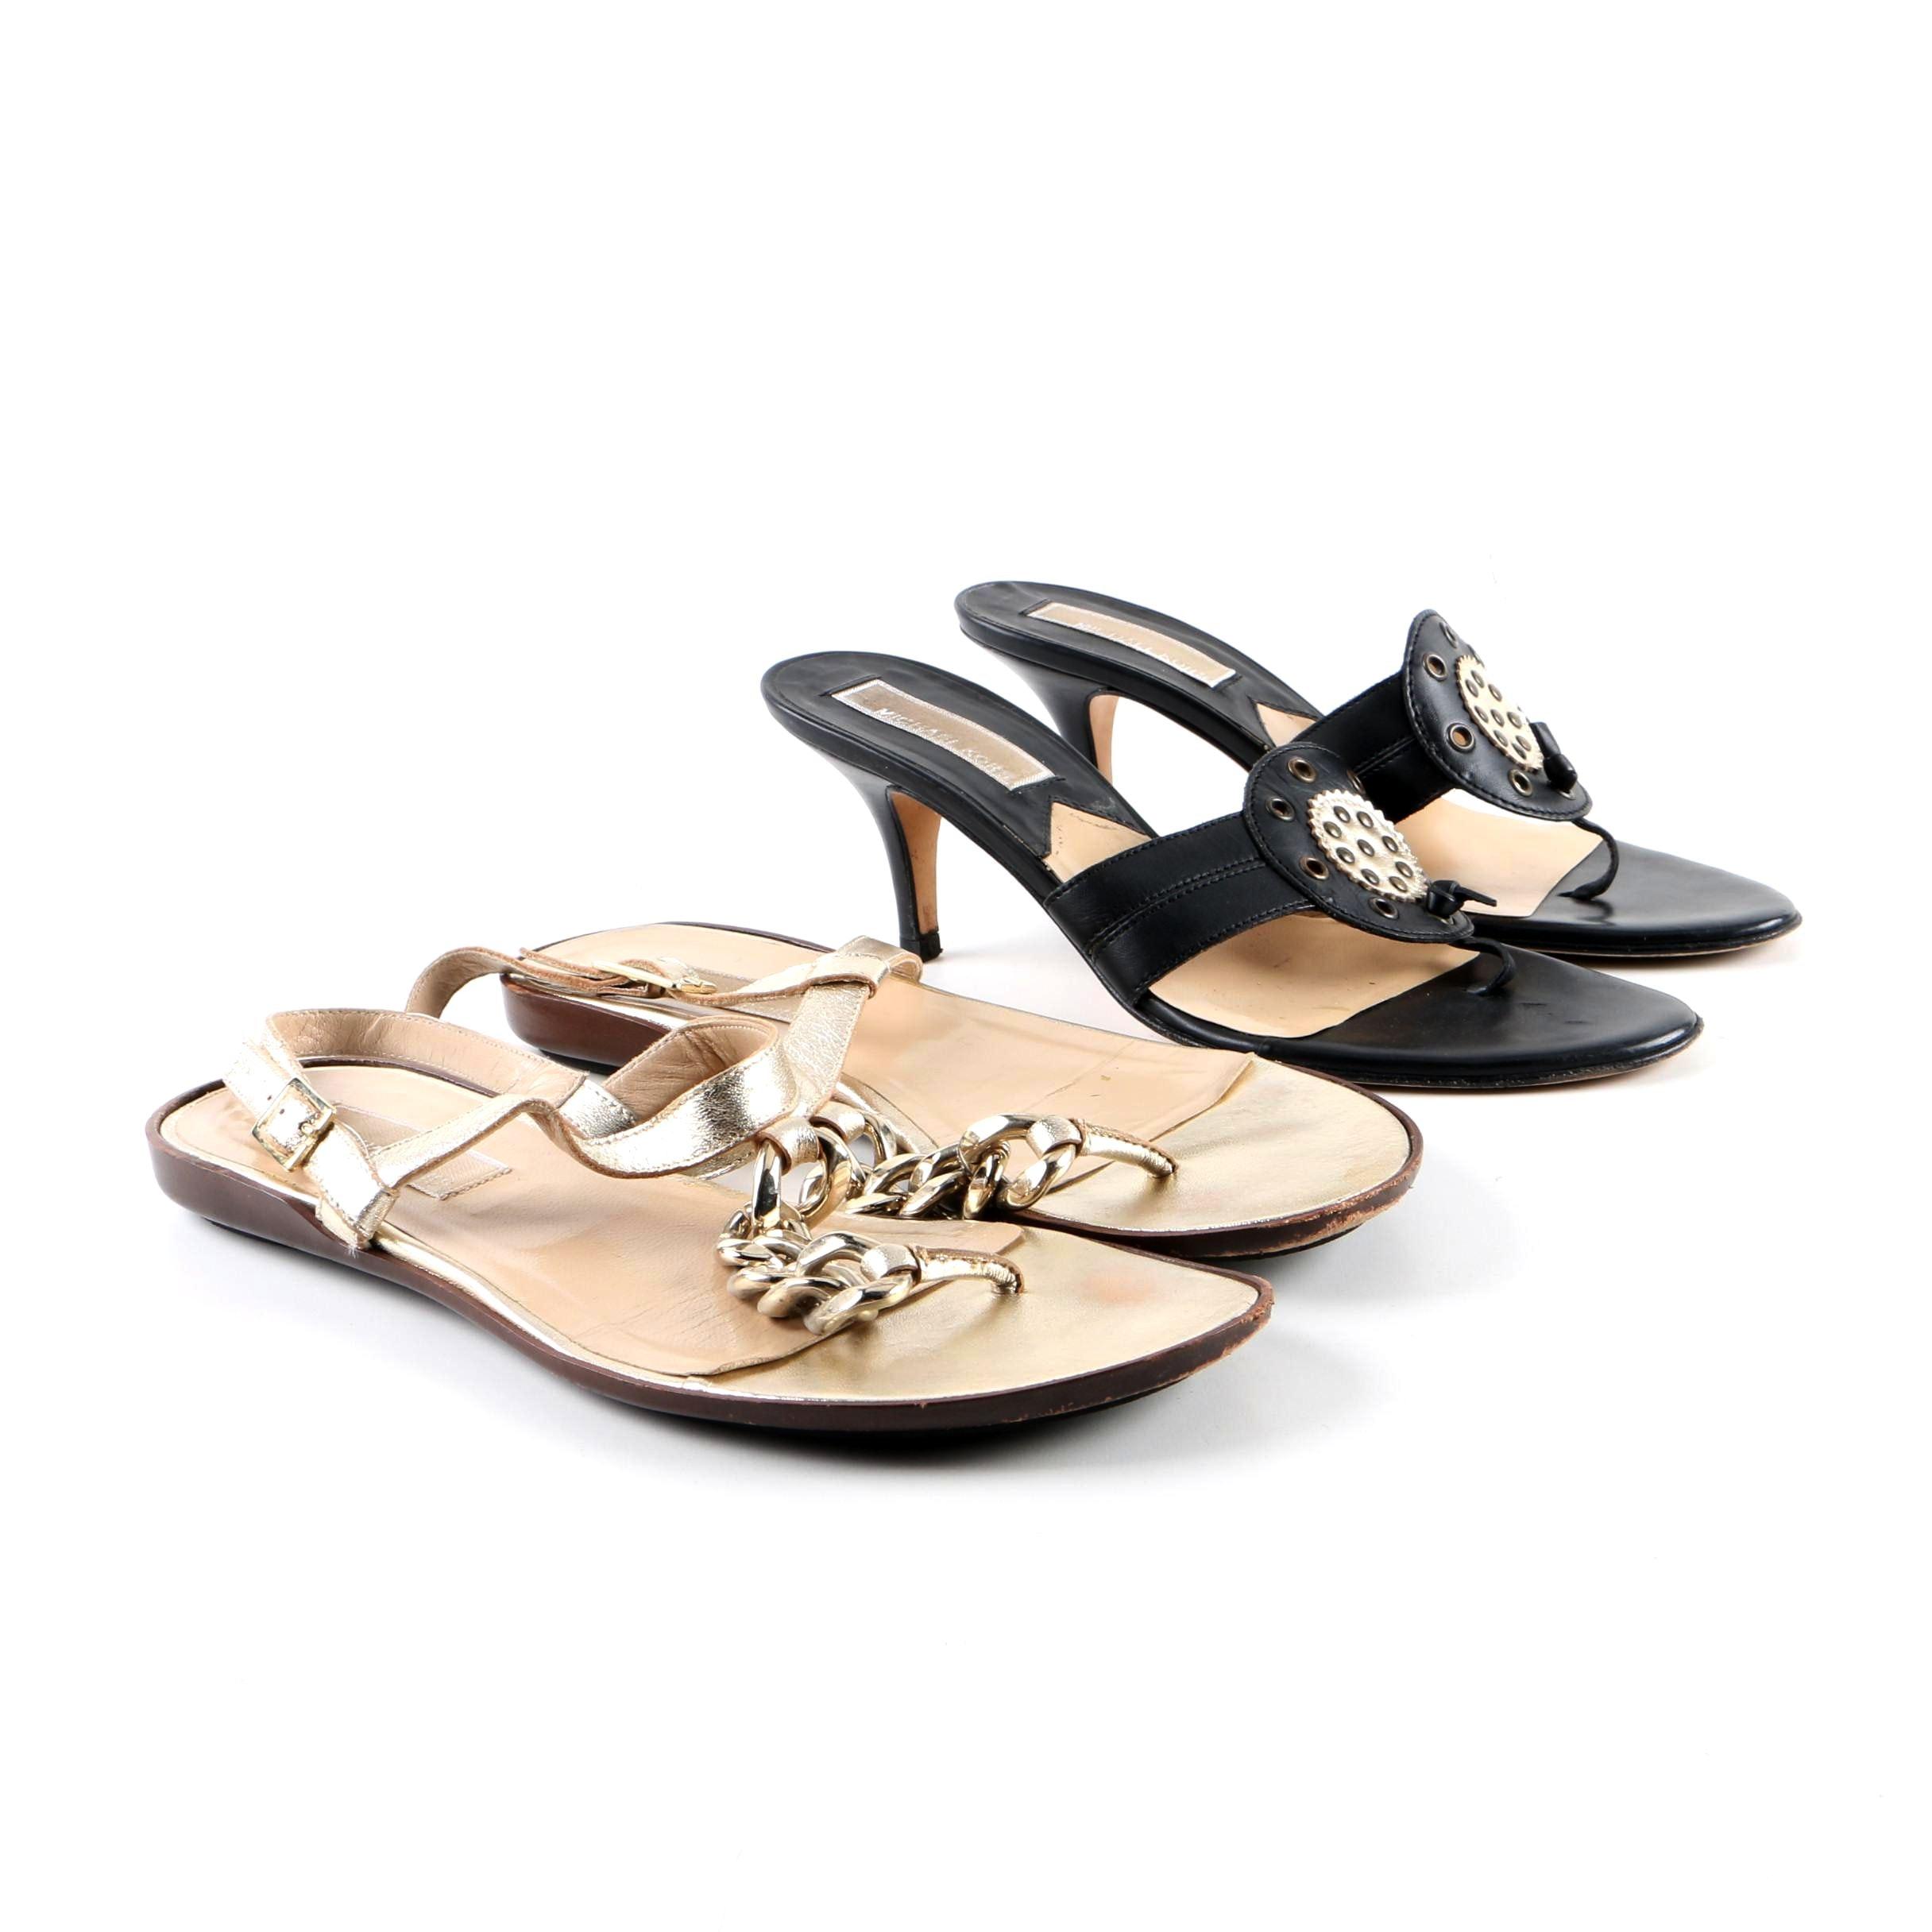 Women's MICHAEL Michael Kors Leather Sandals